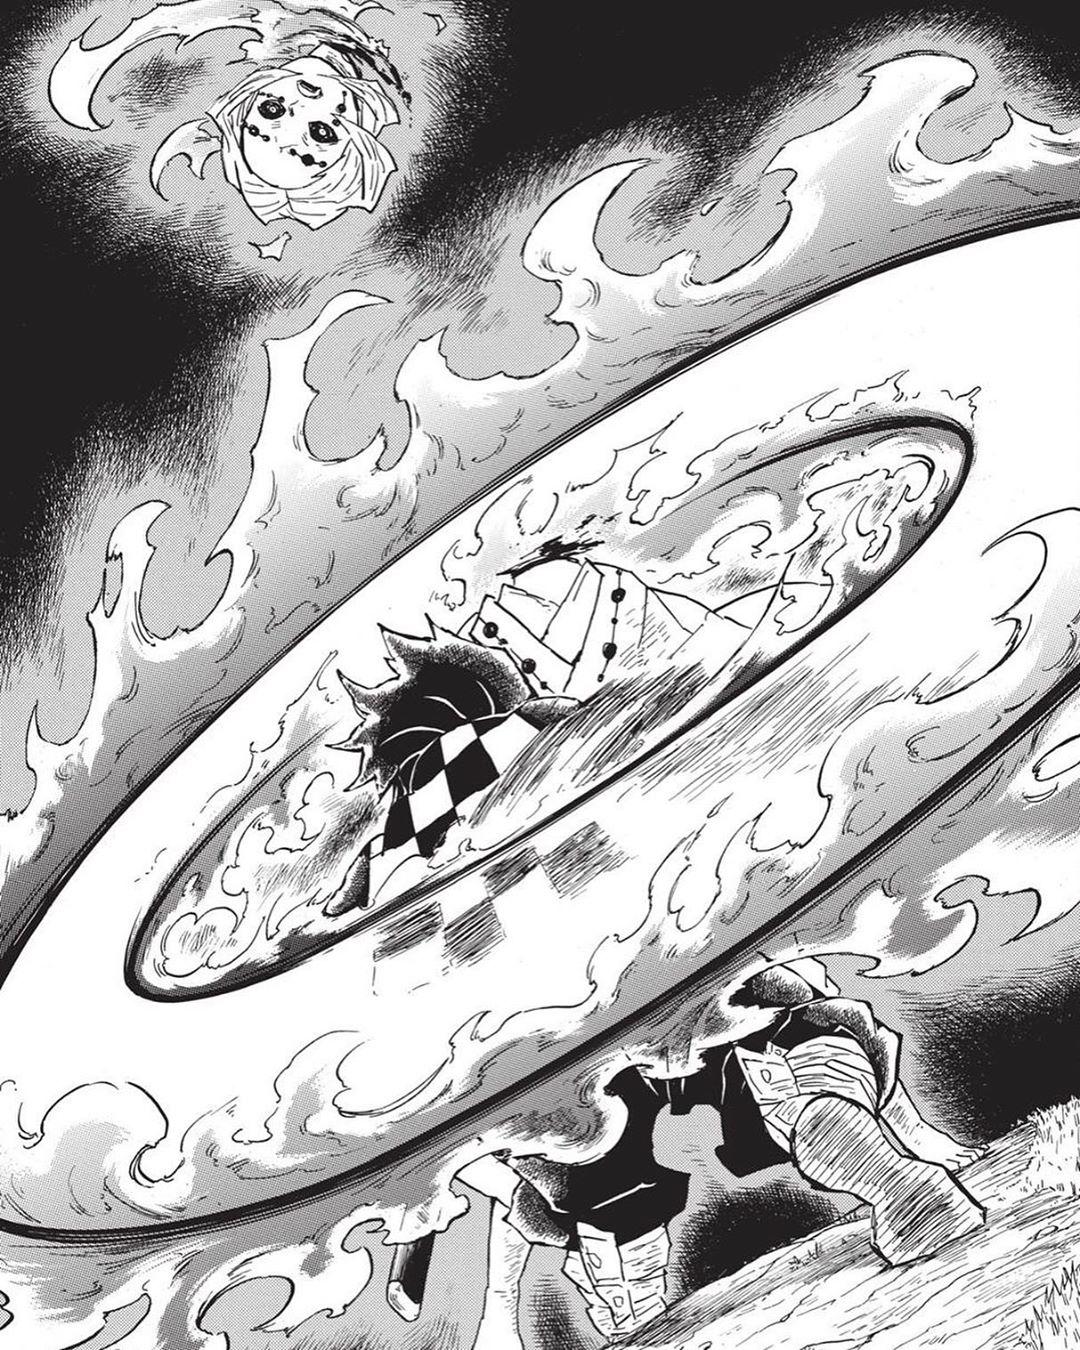 Demon Slayer: Kimetsu No Yaiba Coloring Pages - Coloring Home